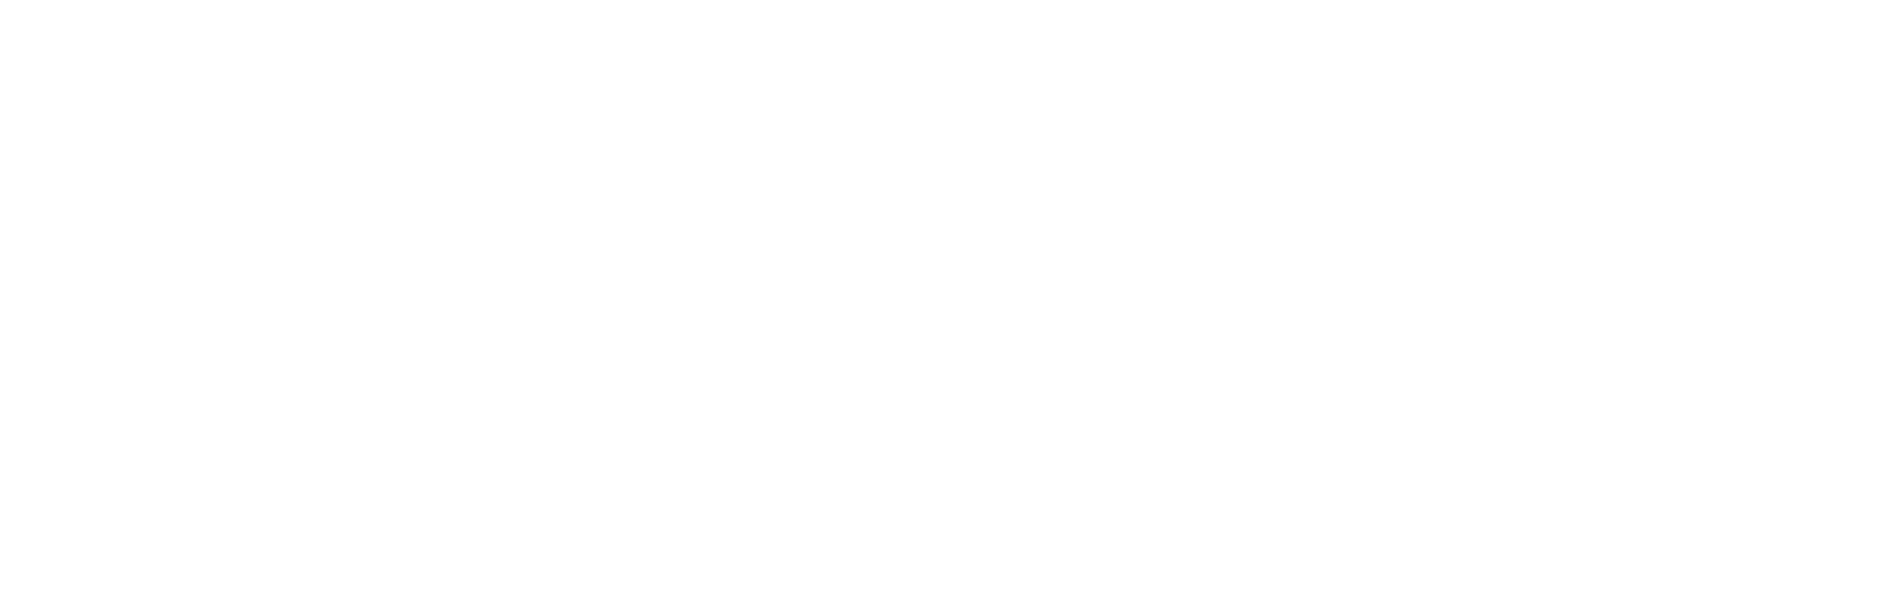 expert-services-logo